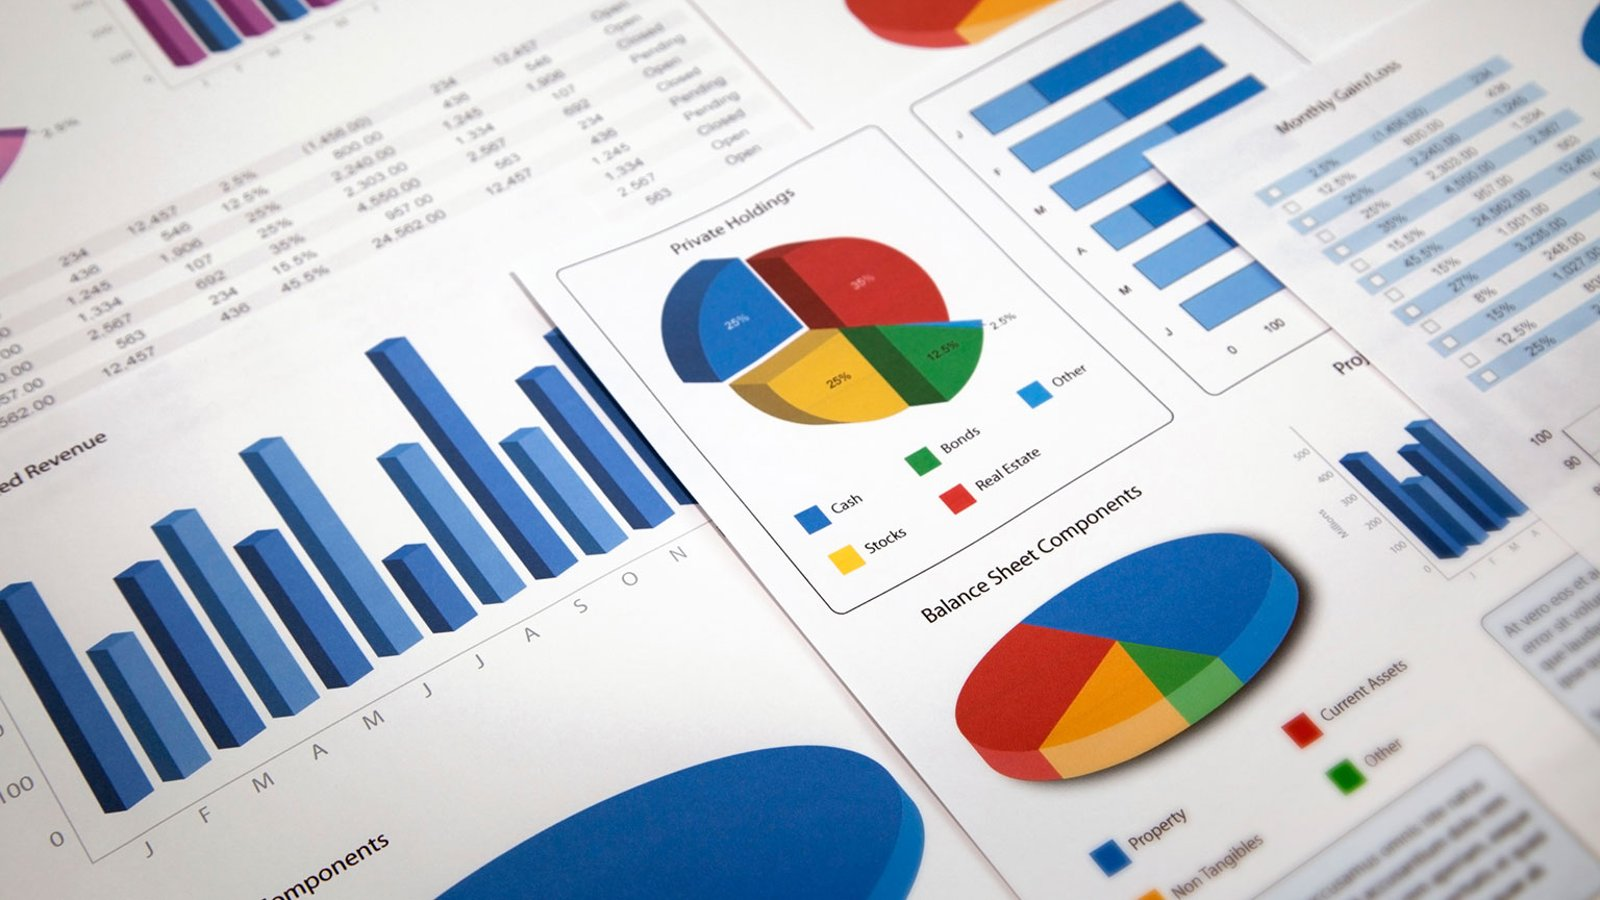 Measuring Operational Performance